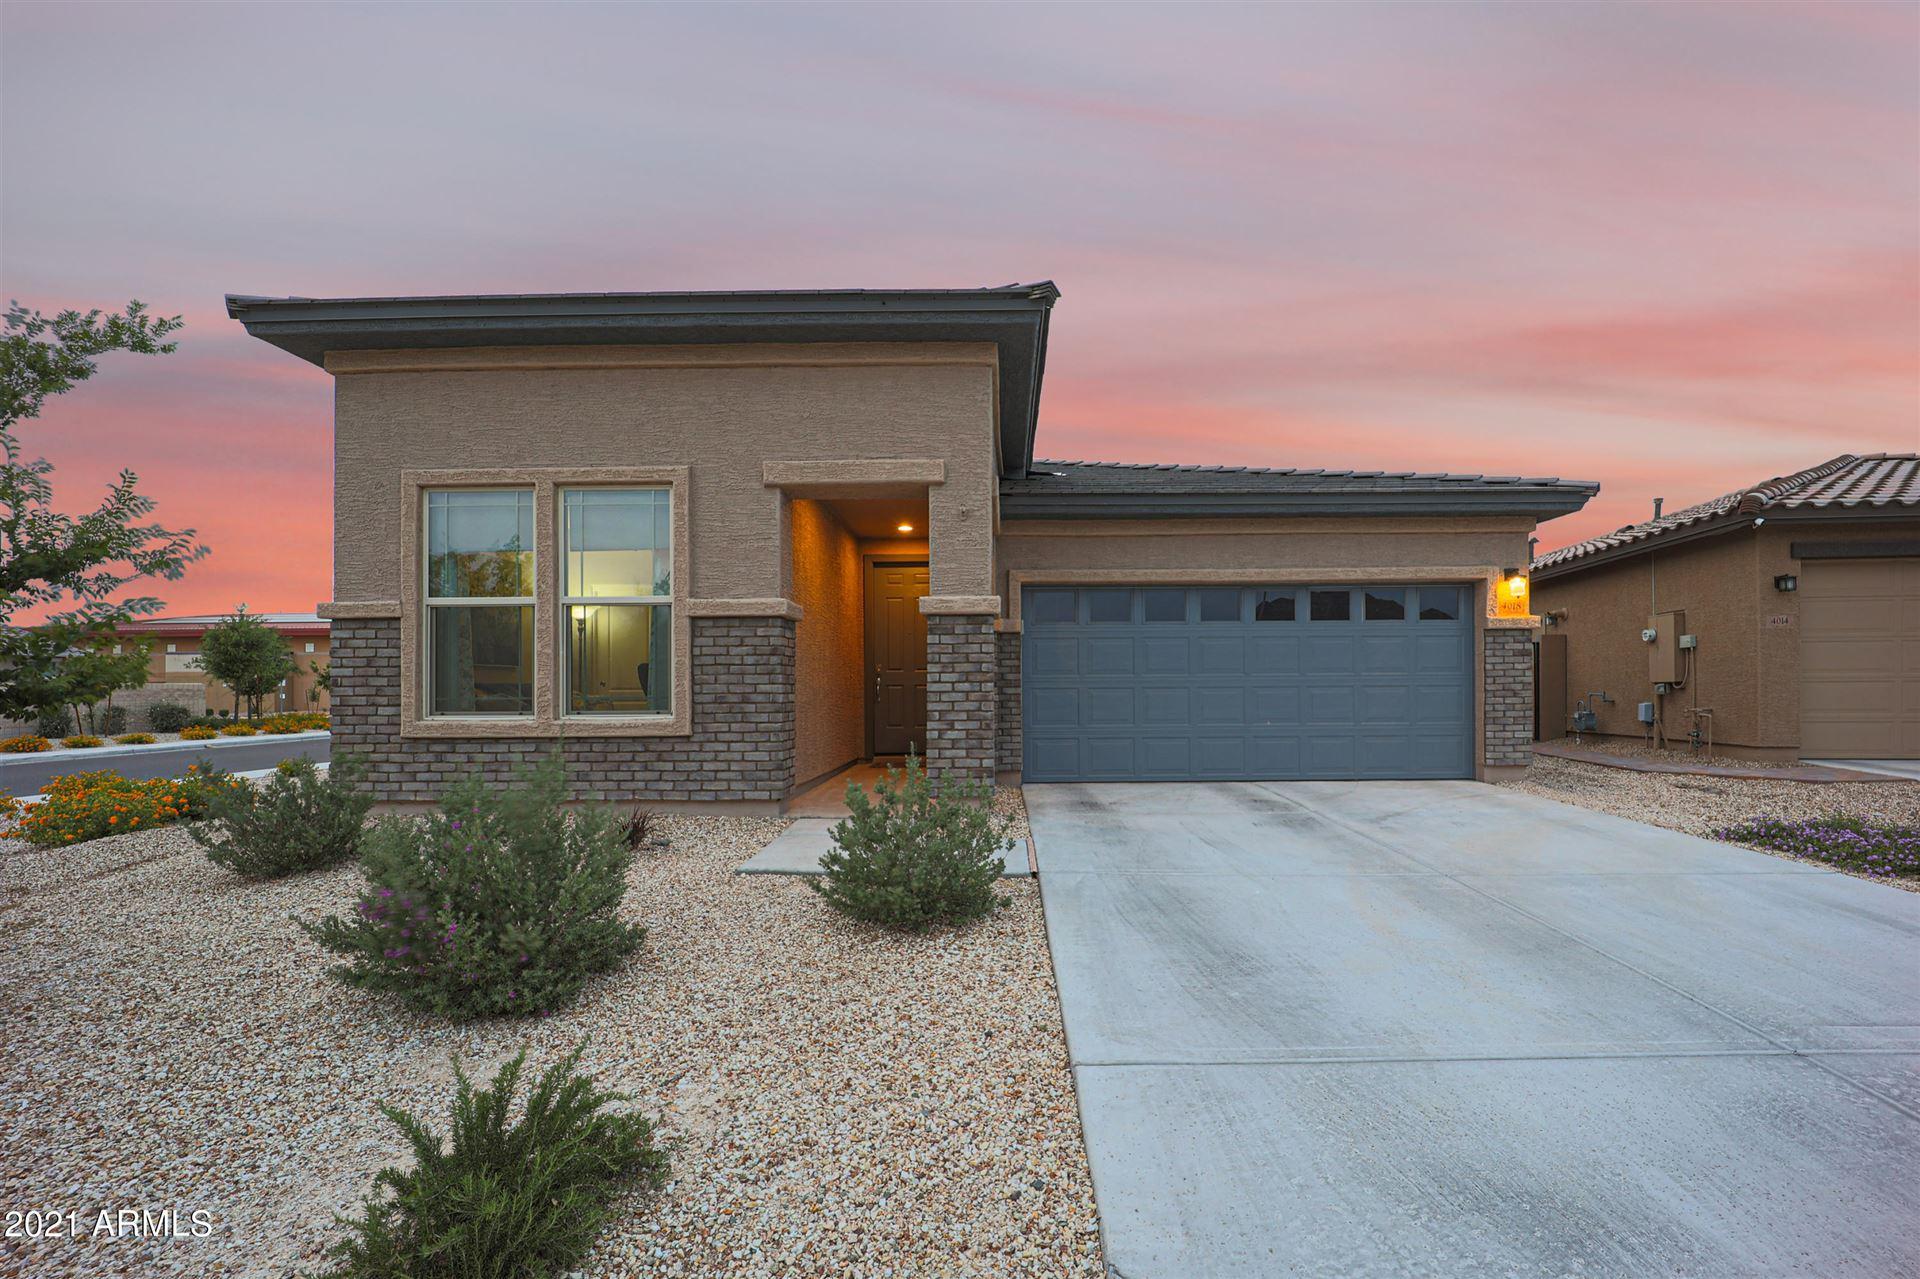 Photo of 4018 W COLES Road, Laveen, AZ 85339 (MLS # 6227502)